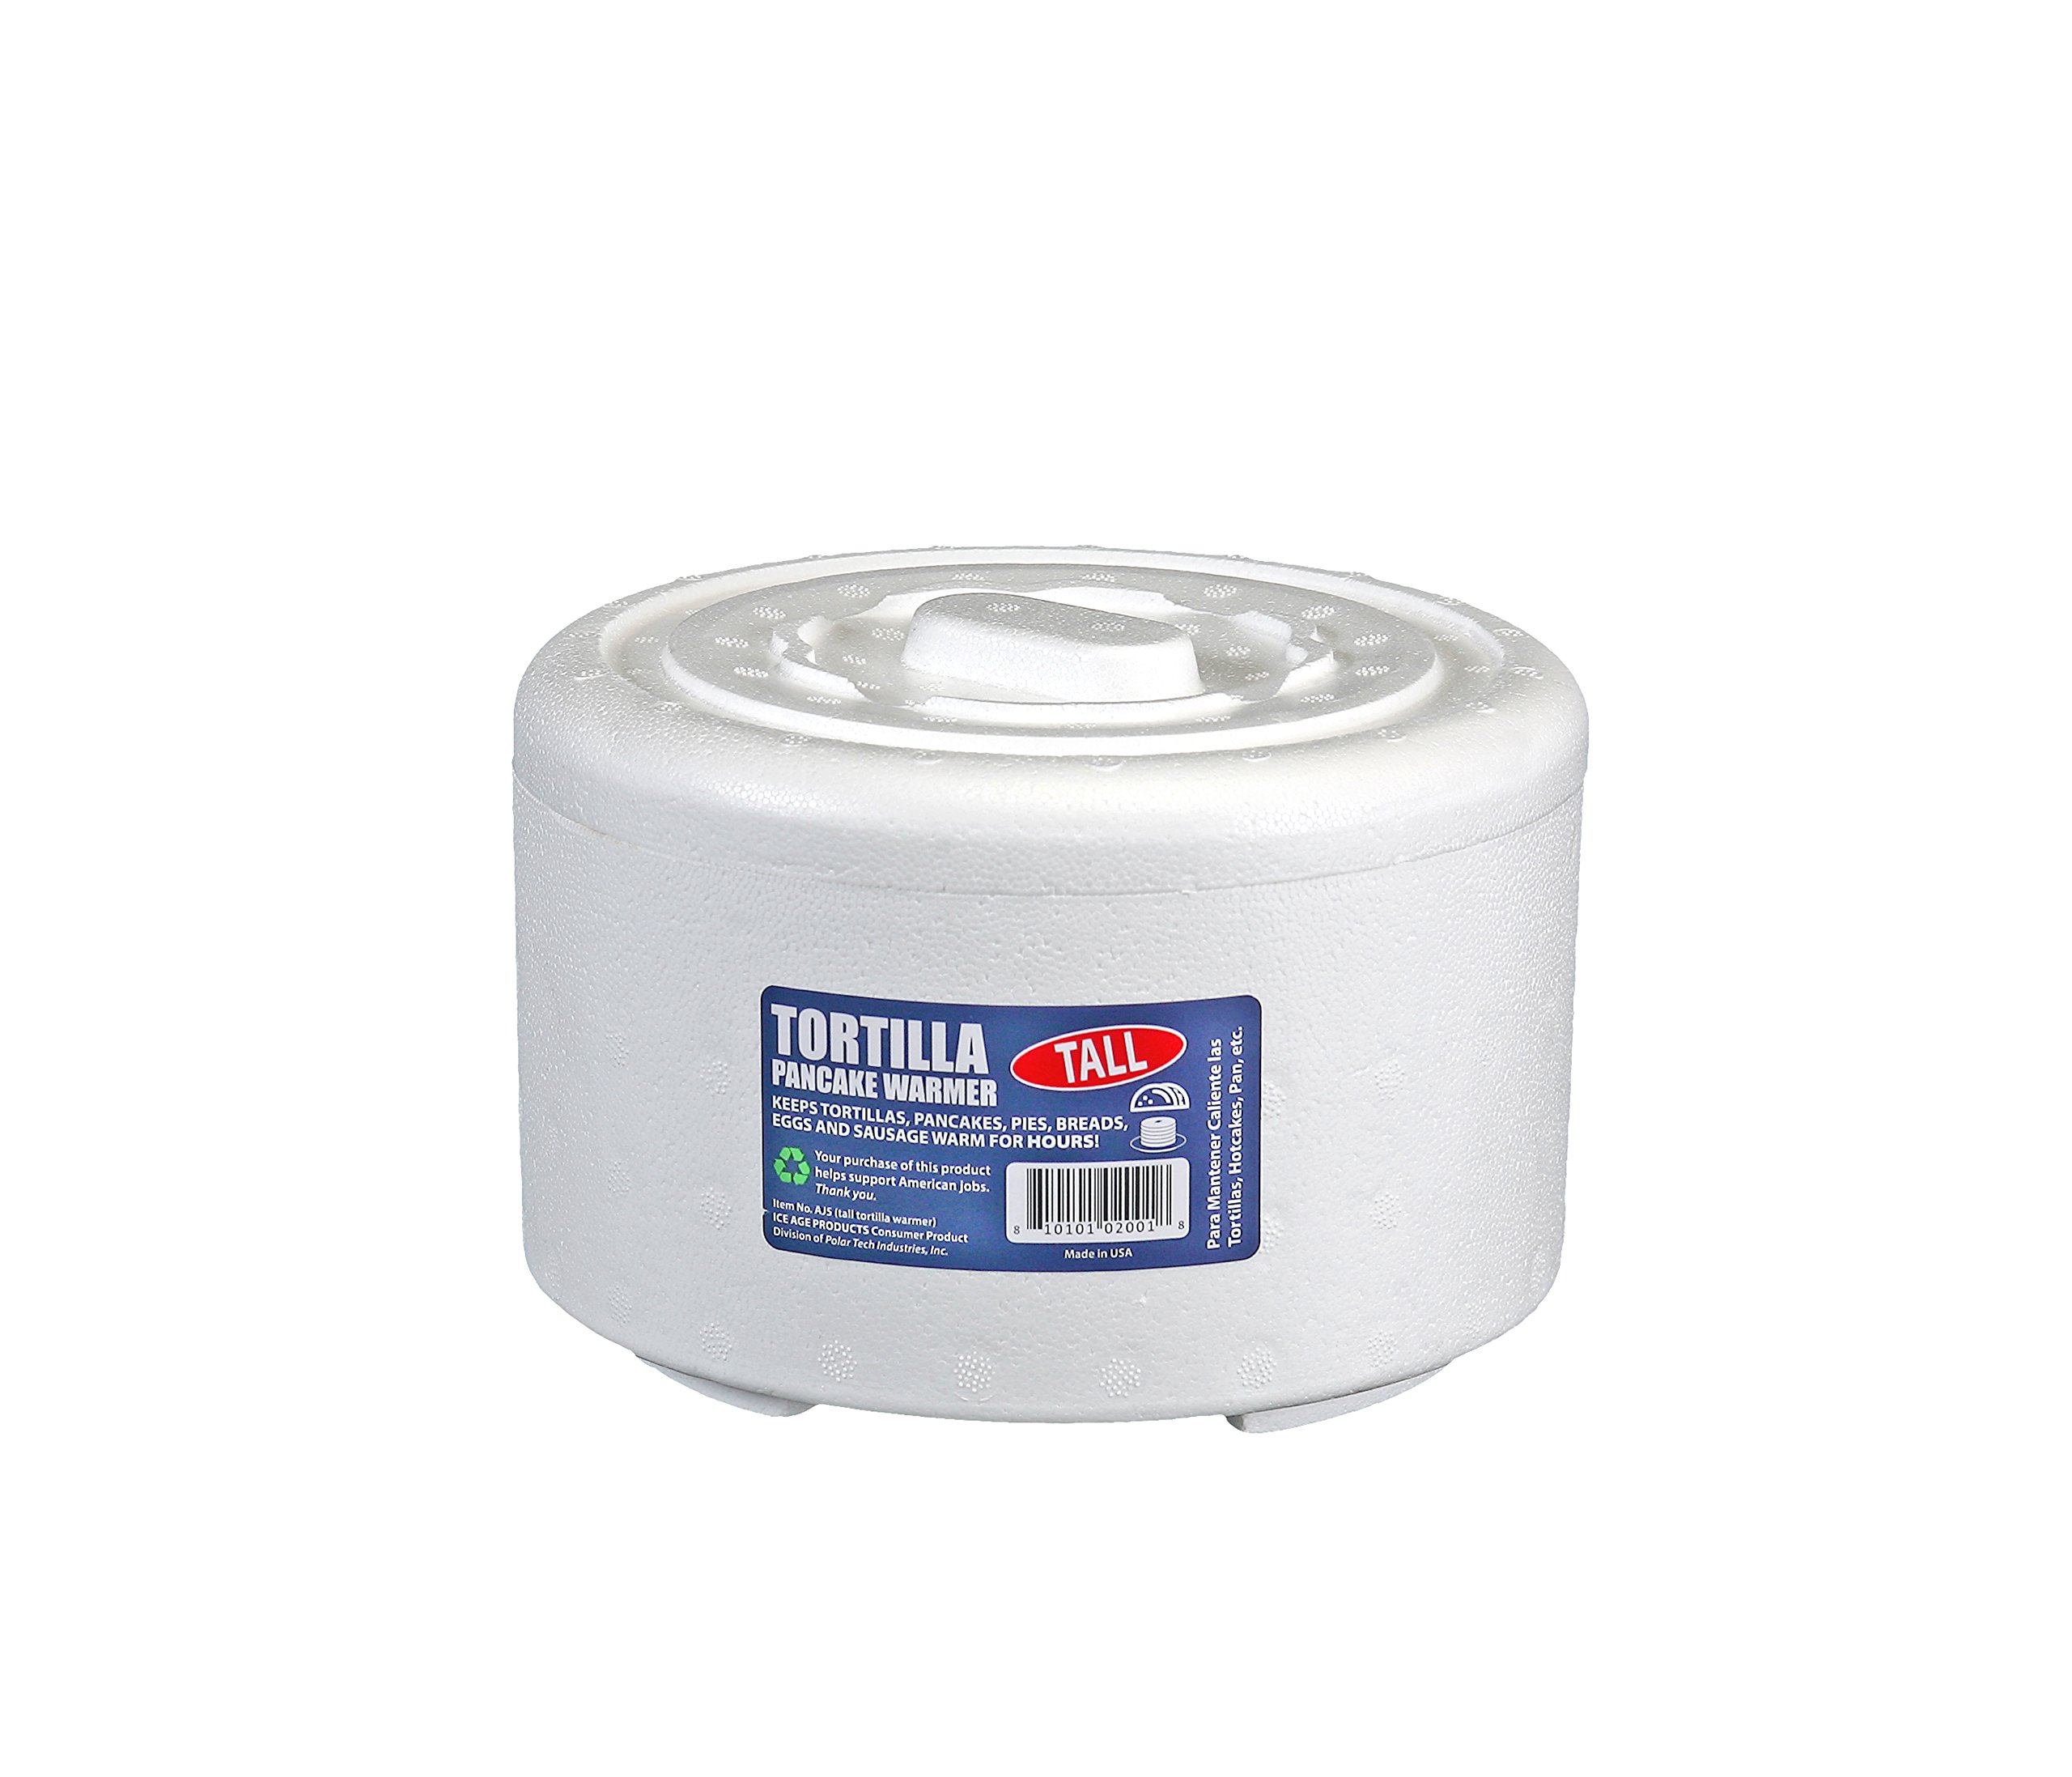 ICE AGE AJ5/2 Tortilla/Pancake Bread Warmer, 6-7/8'' Diameter x 3.5'' (Pack of 2)